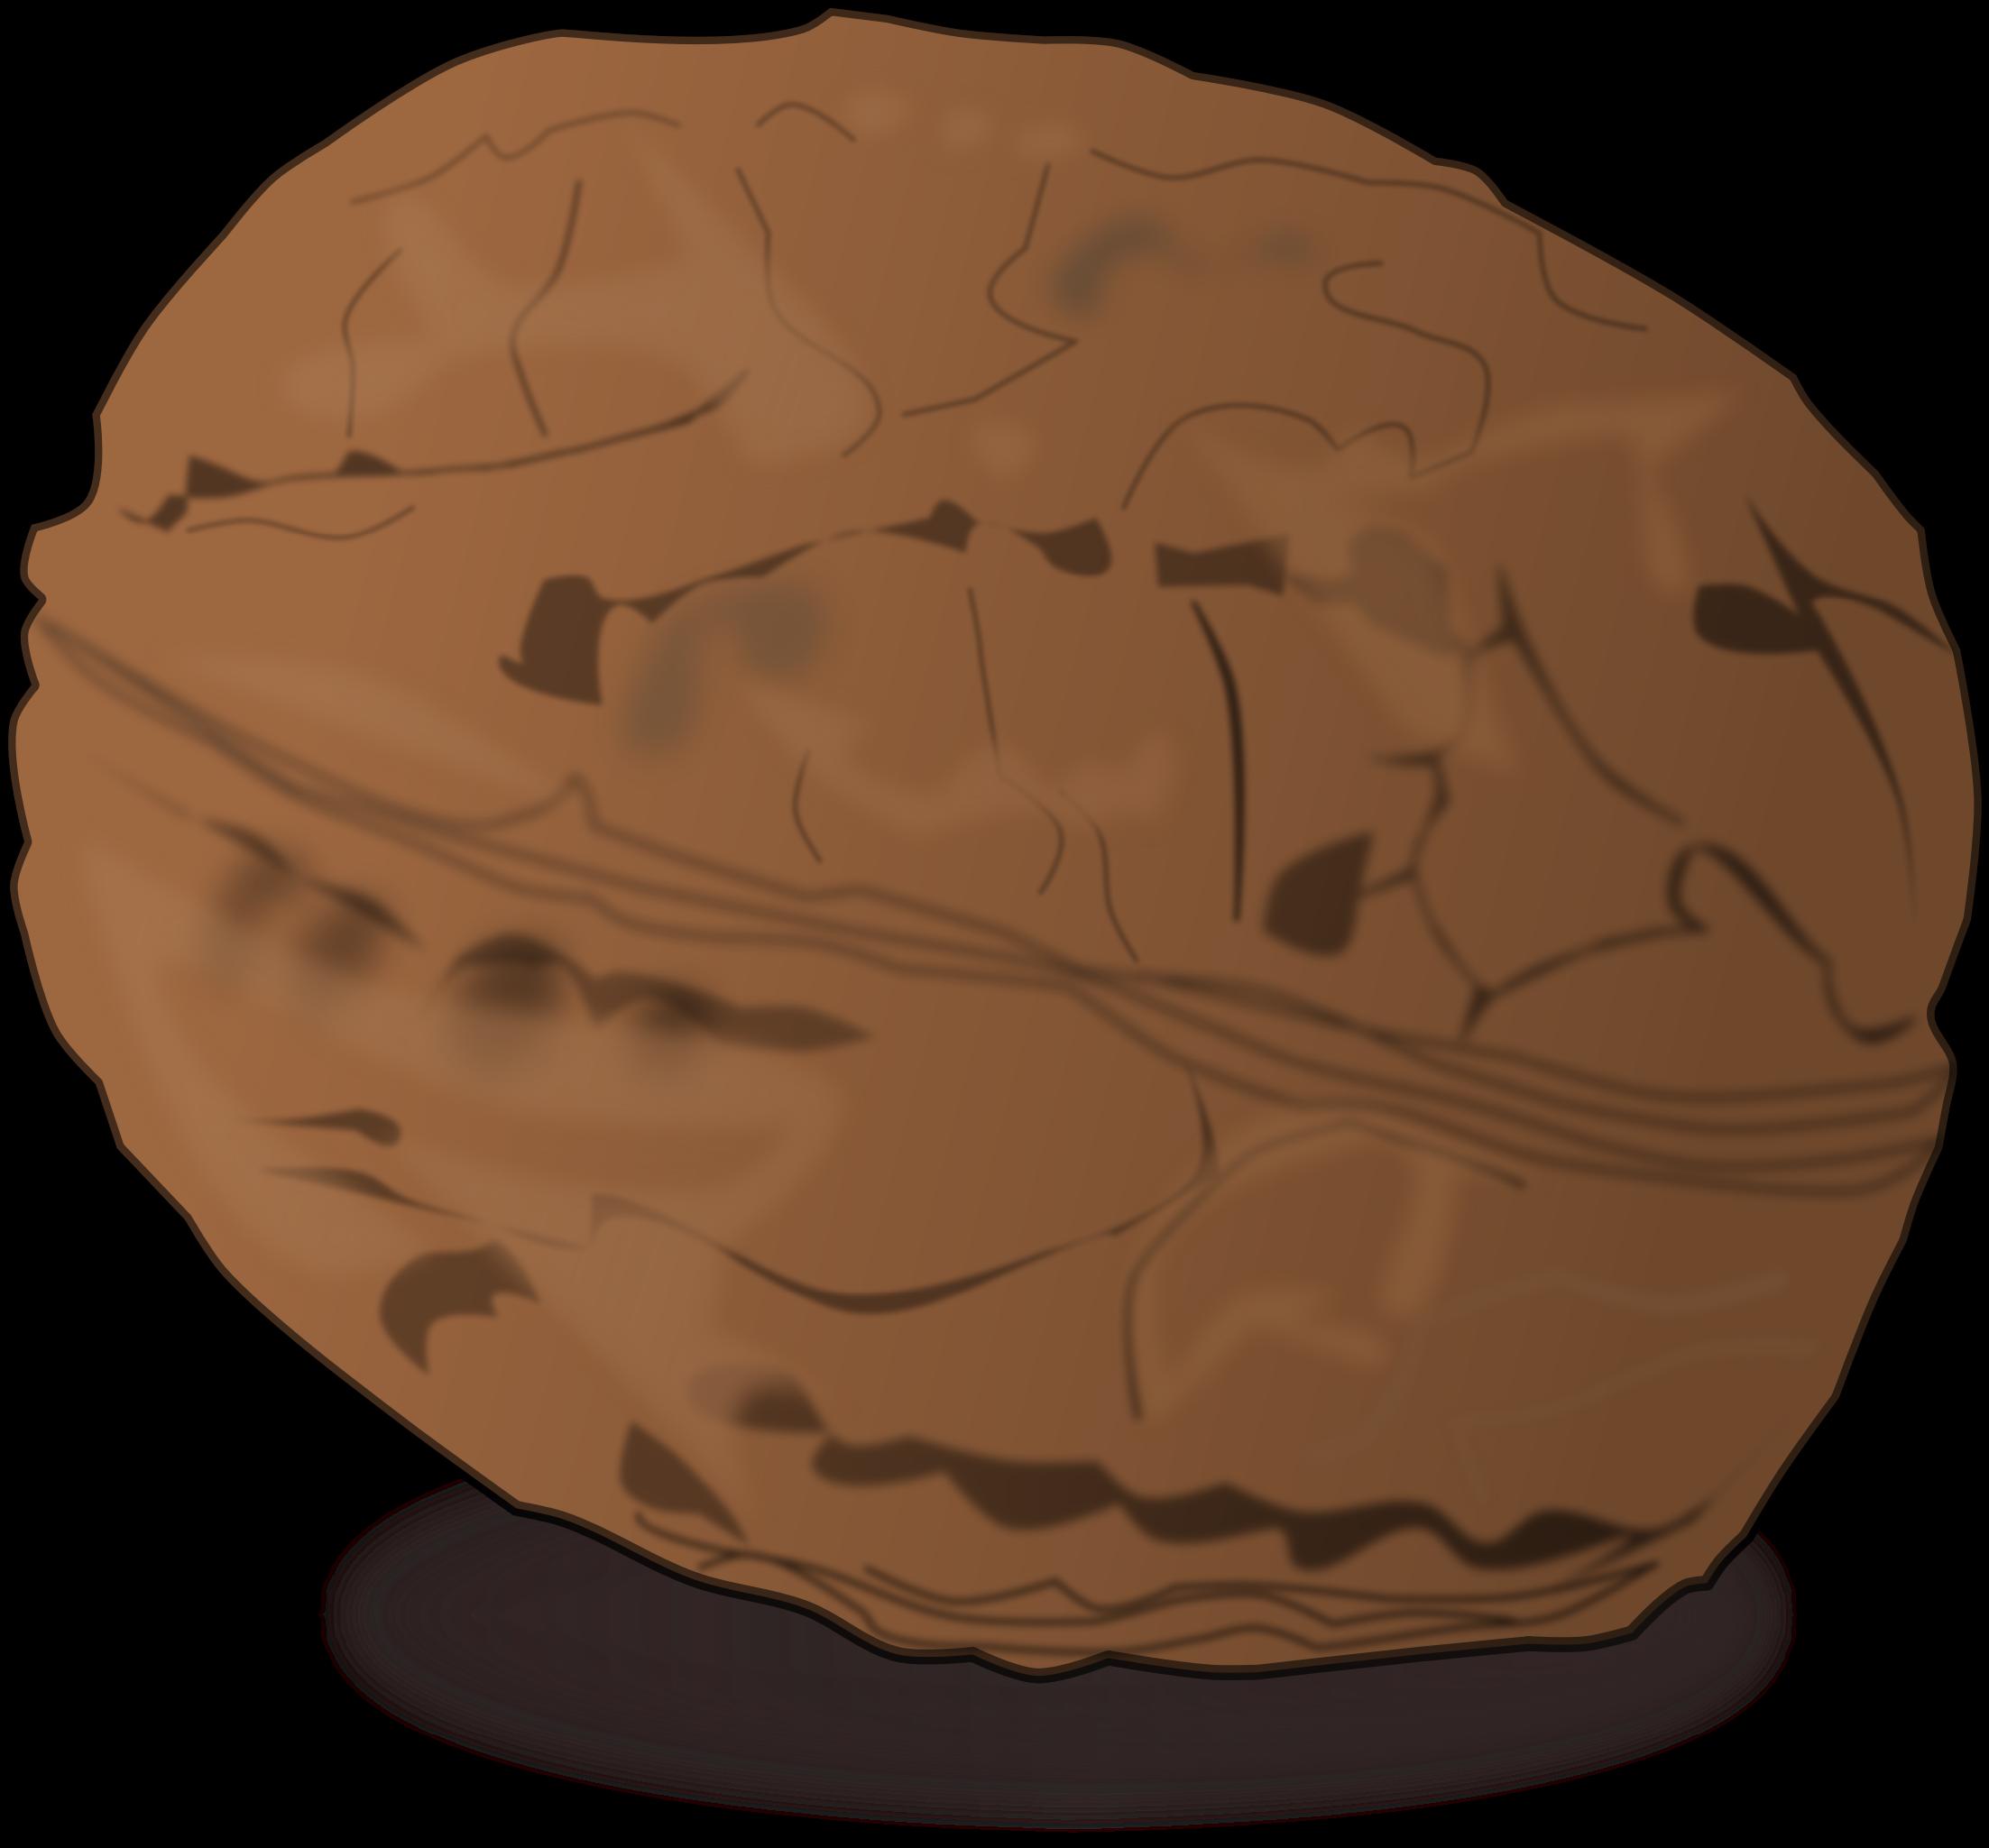 Shaded walnut big image. Nut clipart art